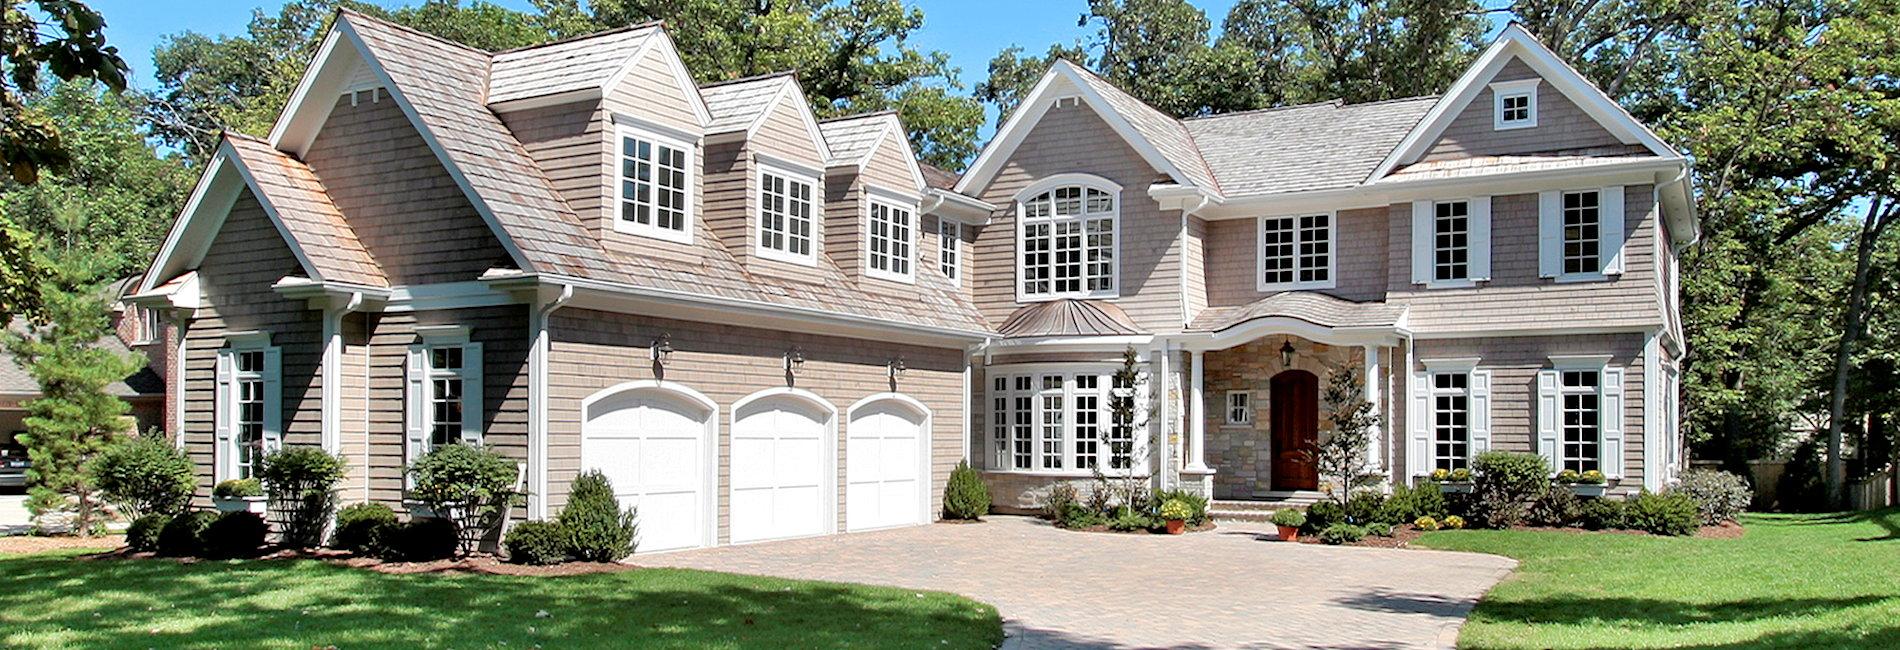 Colorado Residential Appraisals